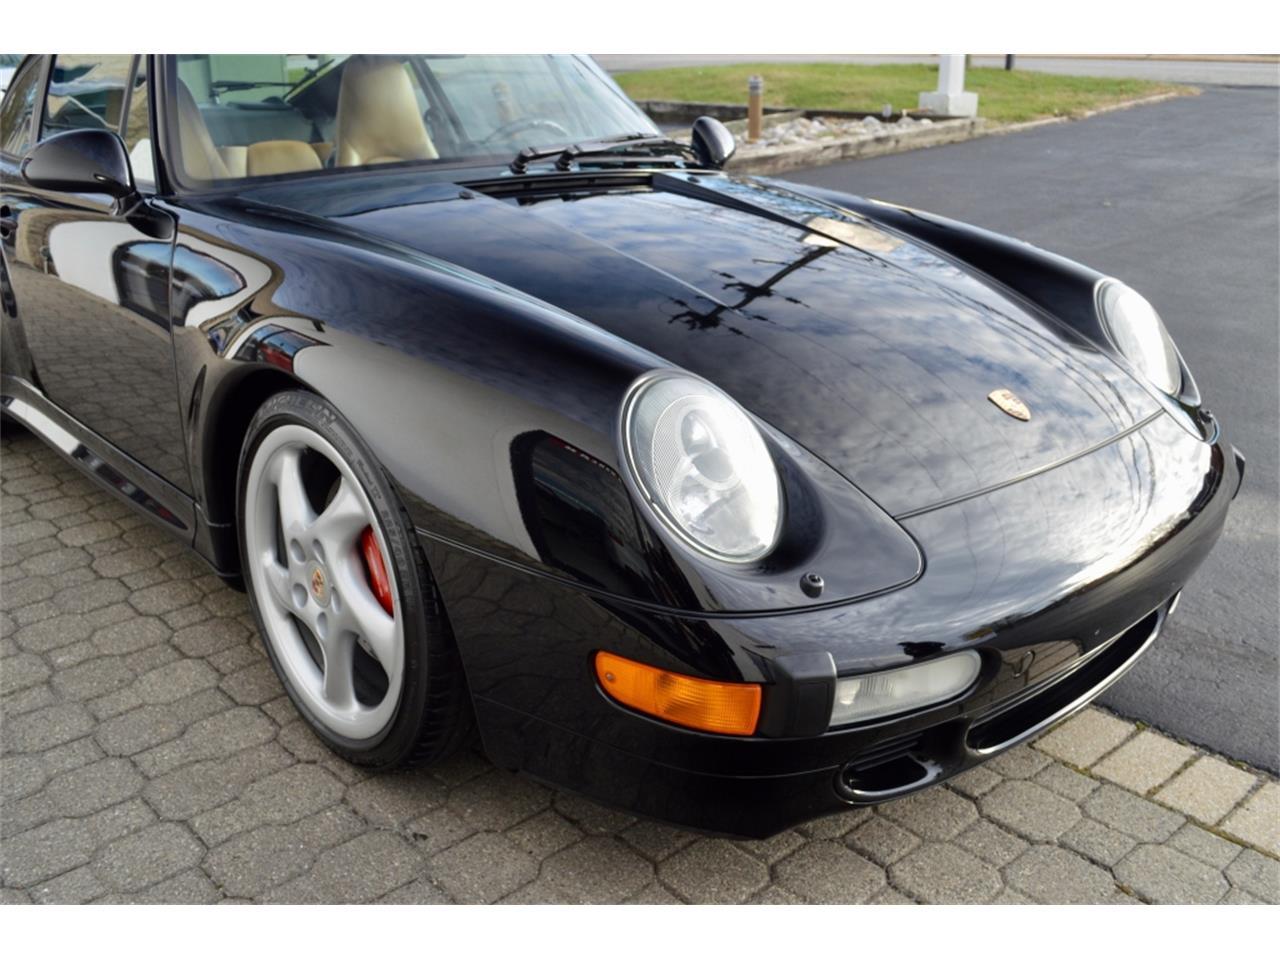 1996 Porsche 993 Turbo (CC-1351927) for sale in West Chester, Pennsylvania